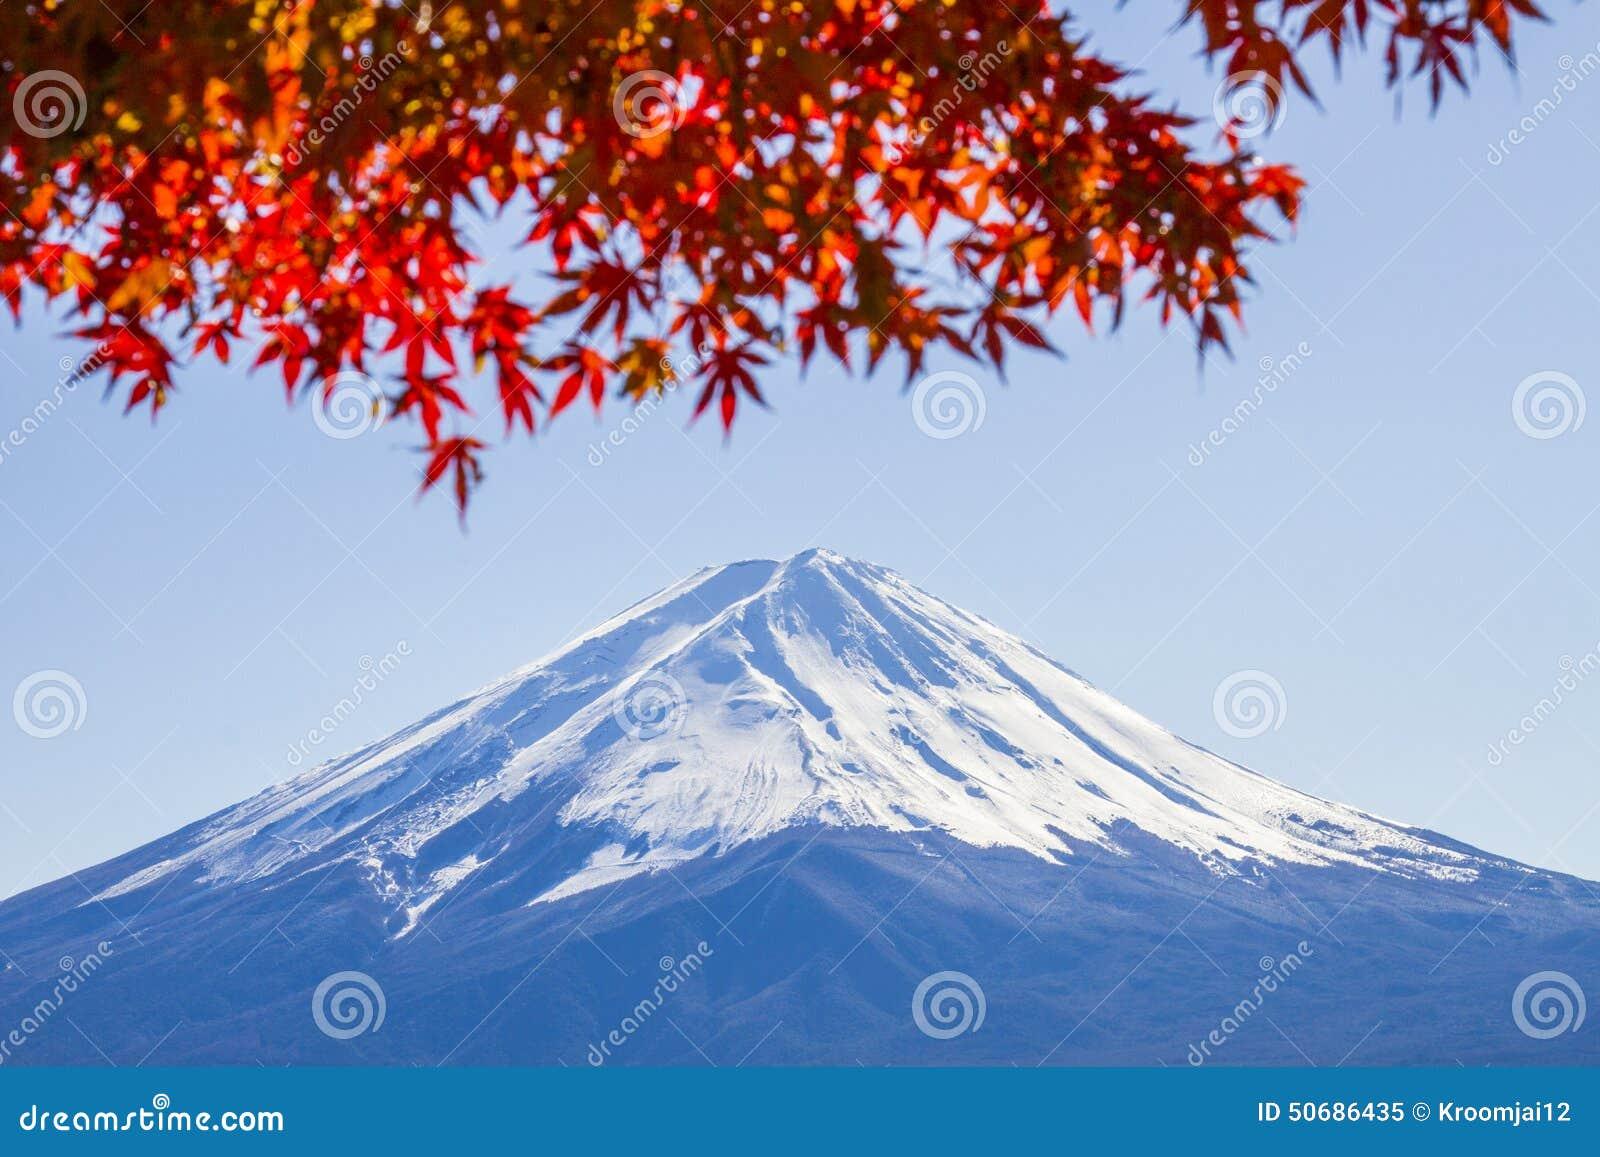 Download 富士mt 库存图片. 图片 包括有 空白, beautifuler, 地标, 天空, 红色, 叶子, 横向 - 50686435